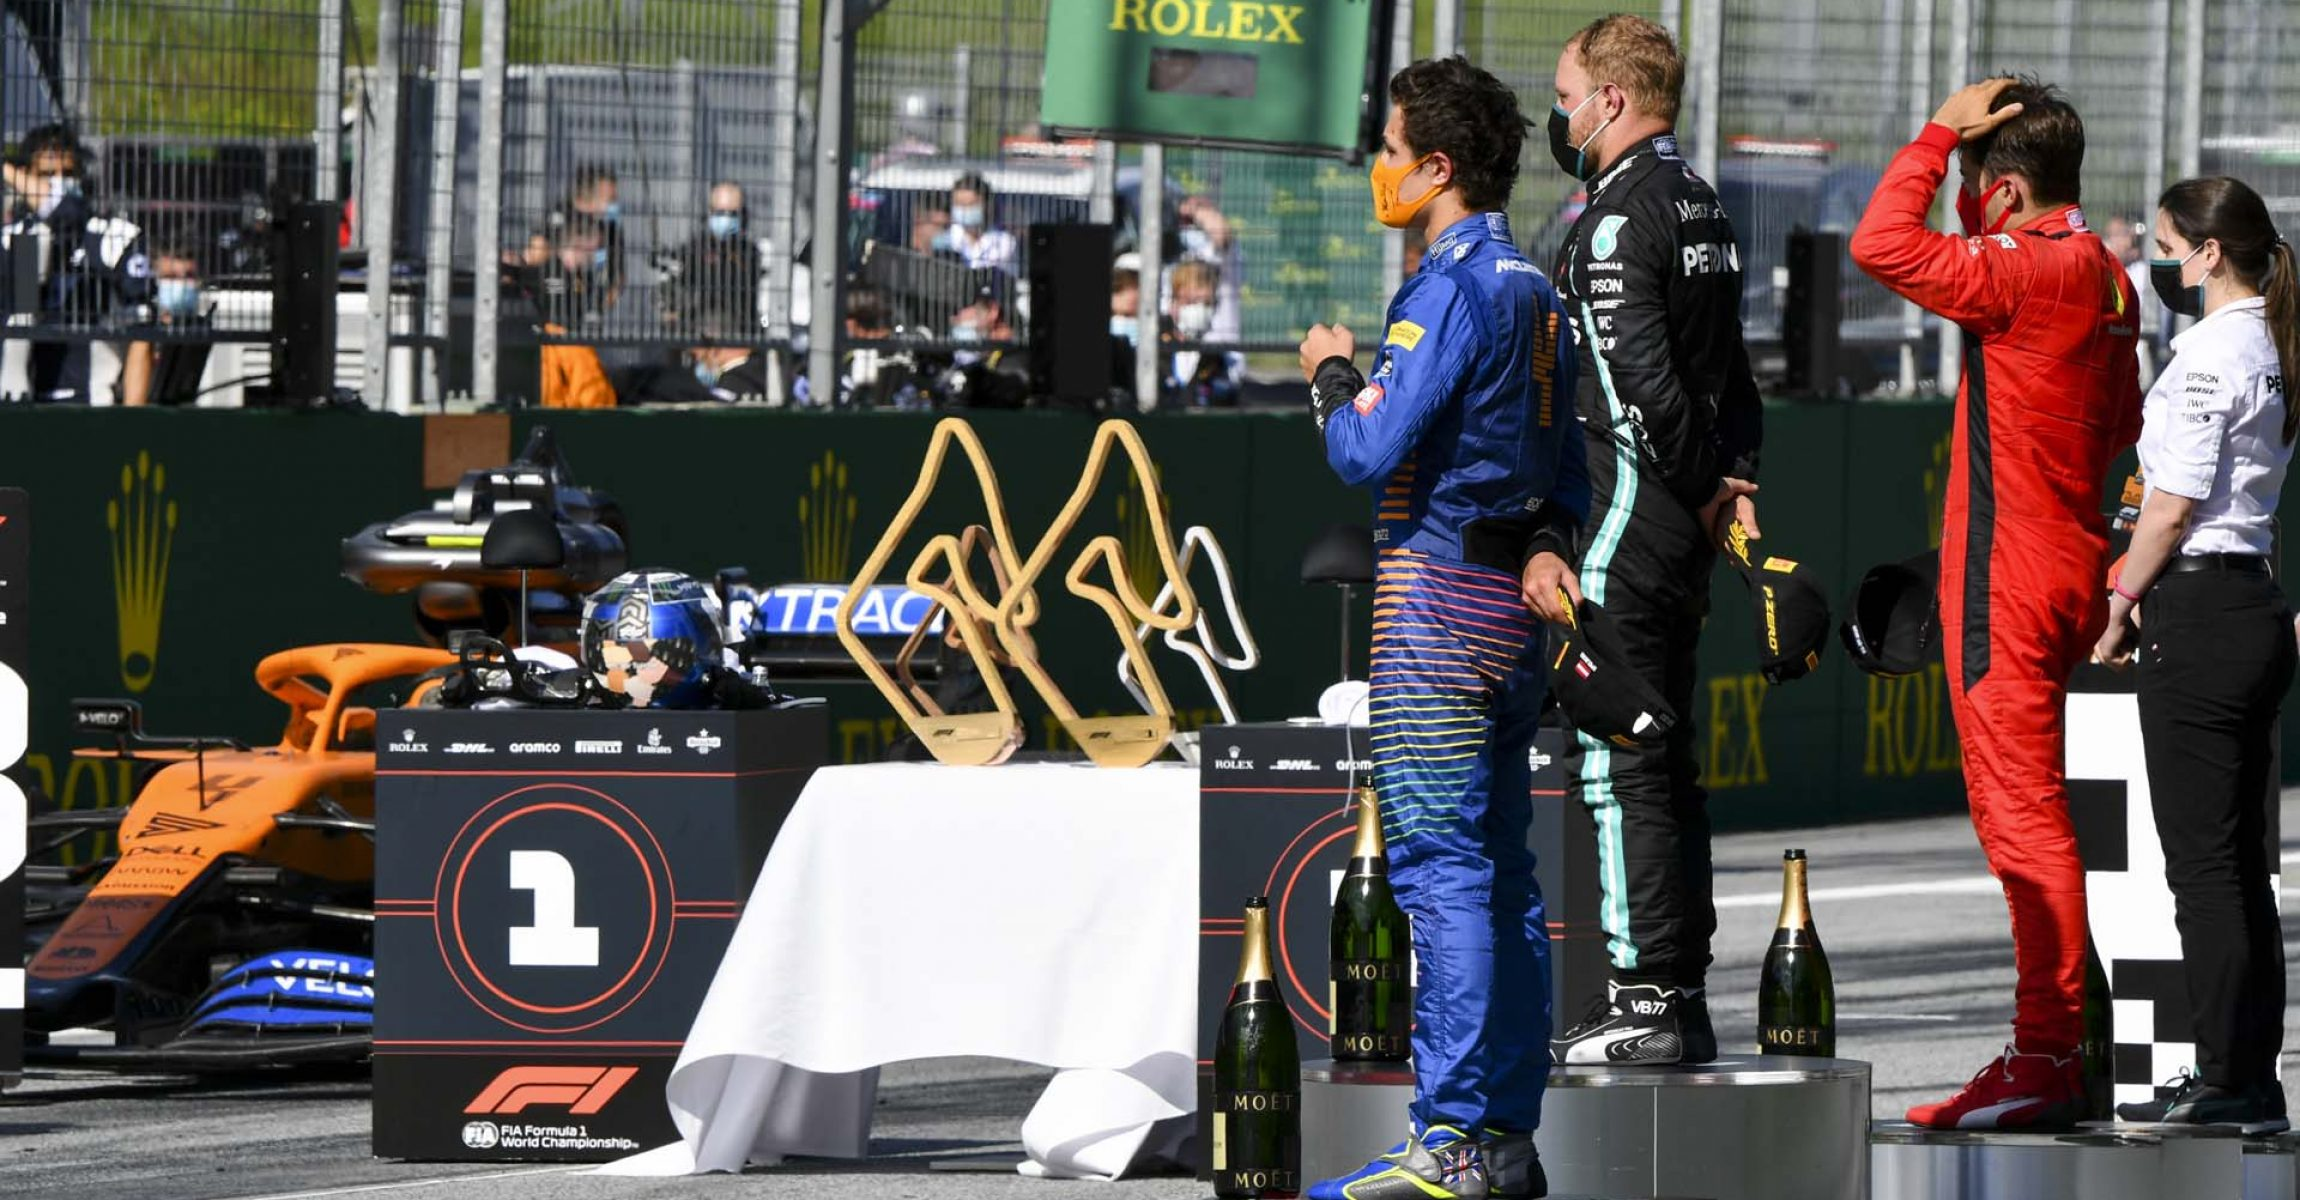 JULY 05: Lando Norris, McLaren, Valtteri Bottas, Mercedes-AMG Petronas F1 and Charles Leclerc, Ferrari on the podium during the Austrian GP on Sunday July 05, 2020. (Photo by Mark Sutton / LAT Images)